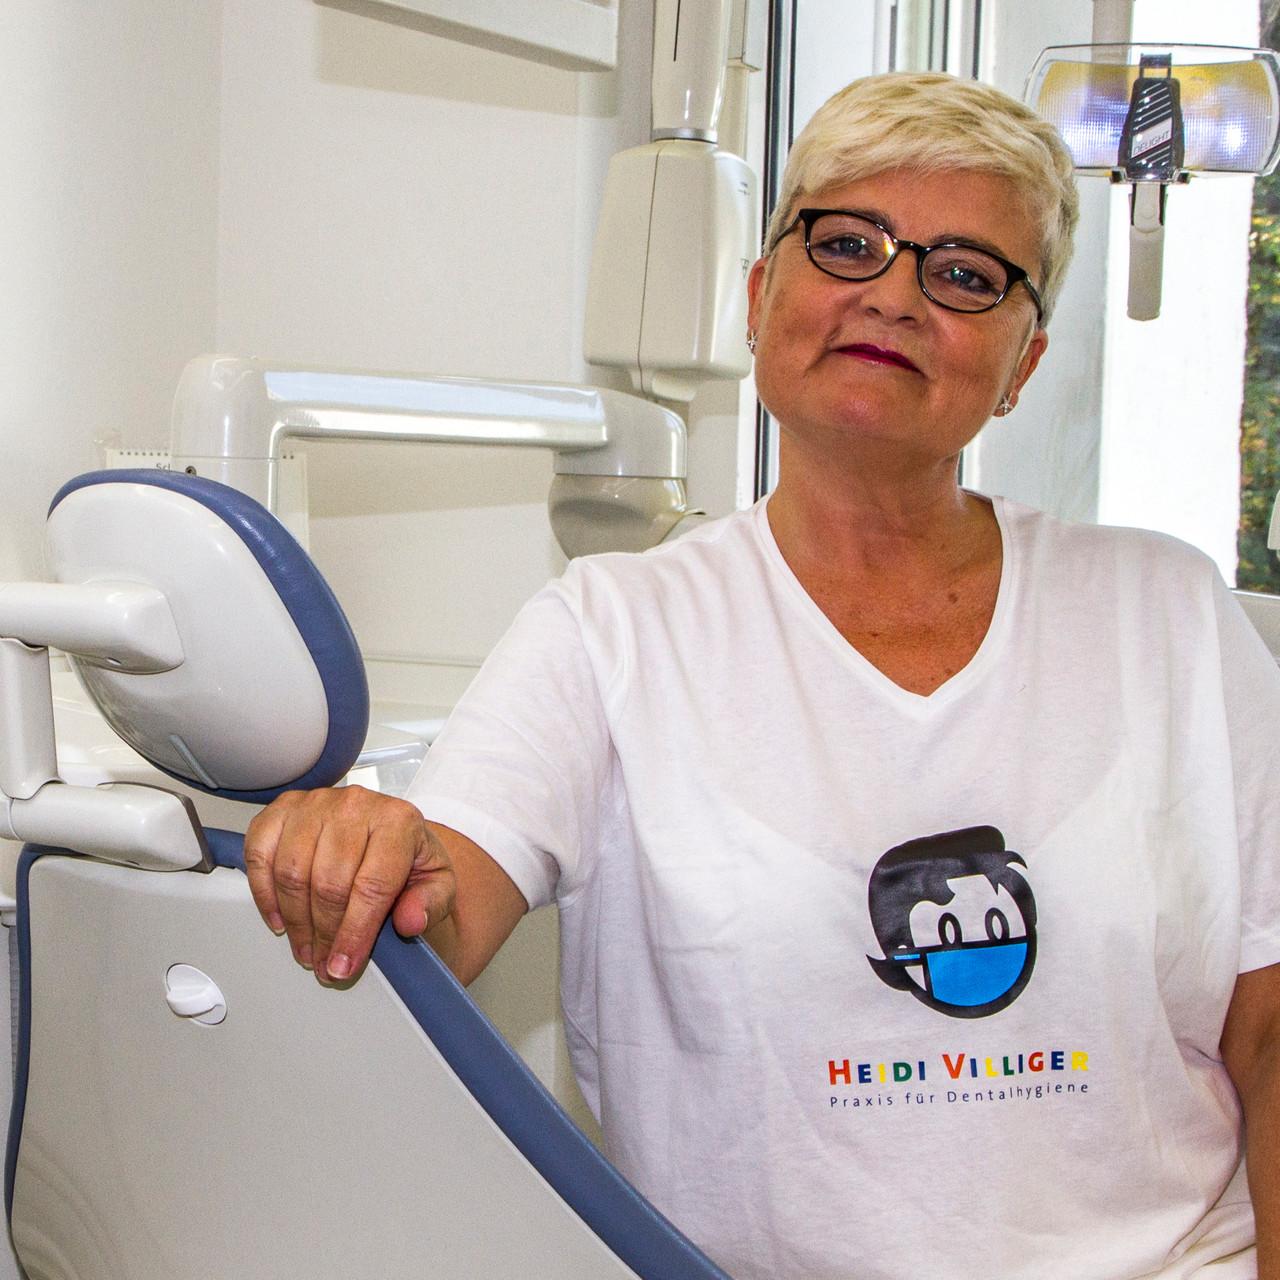 Dentalhygiene: Heidi Villiger